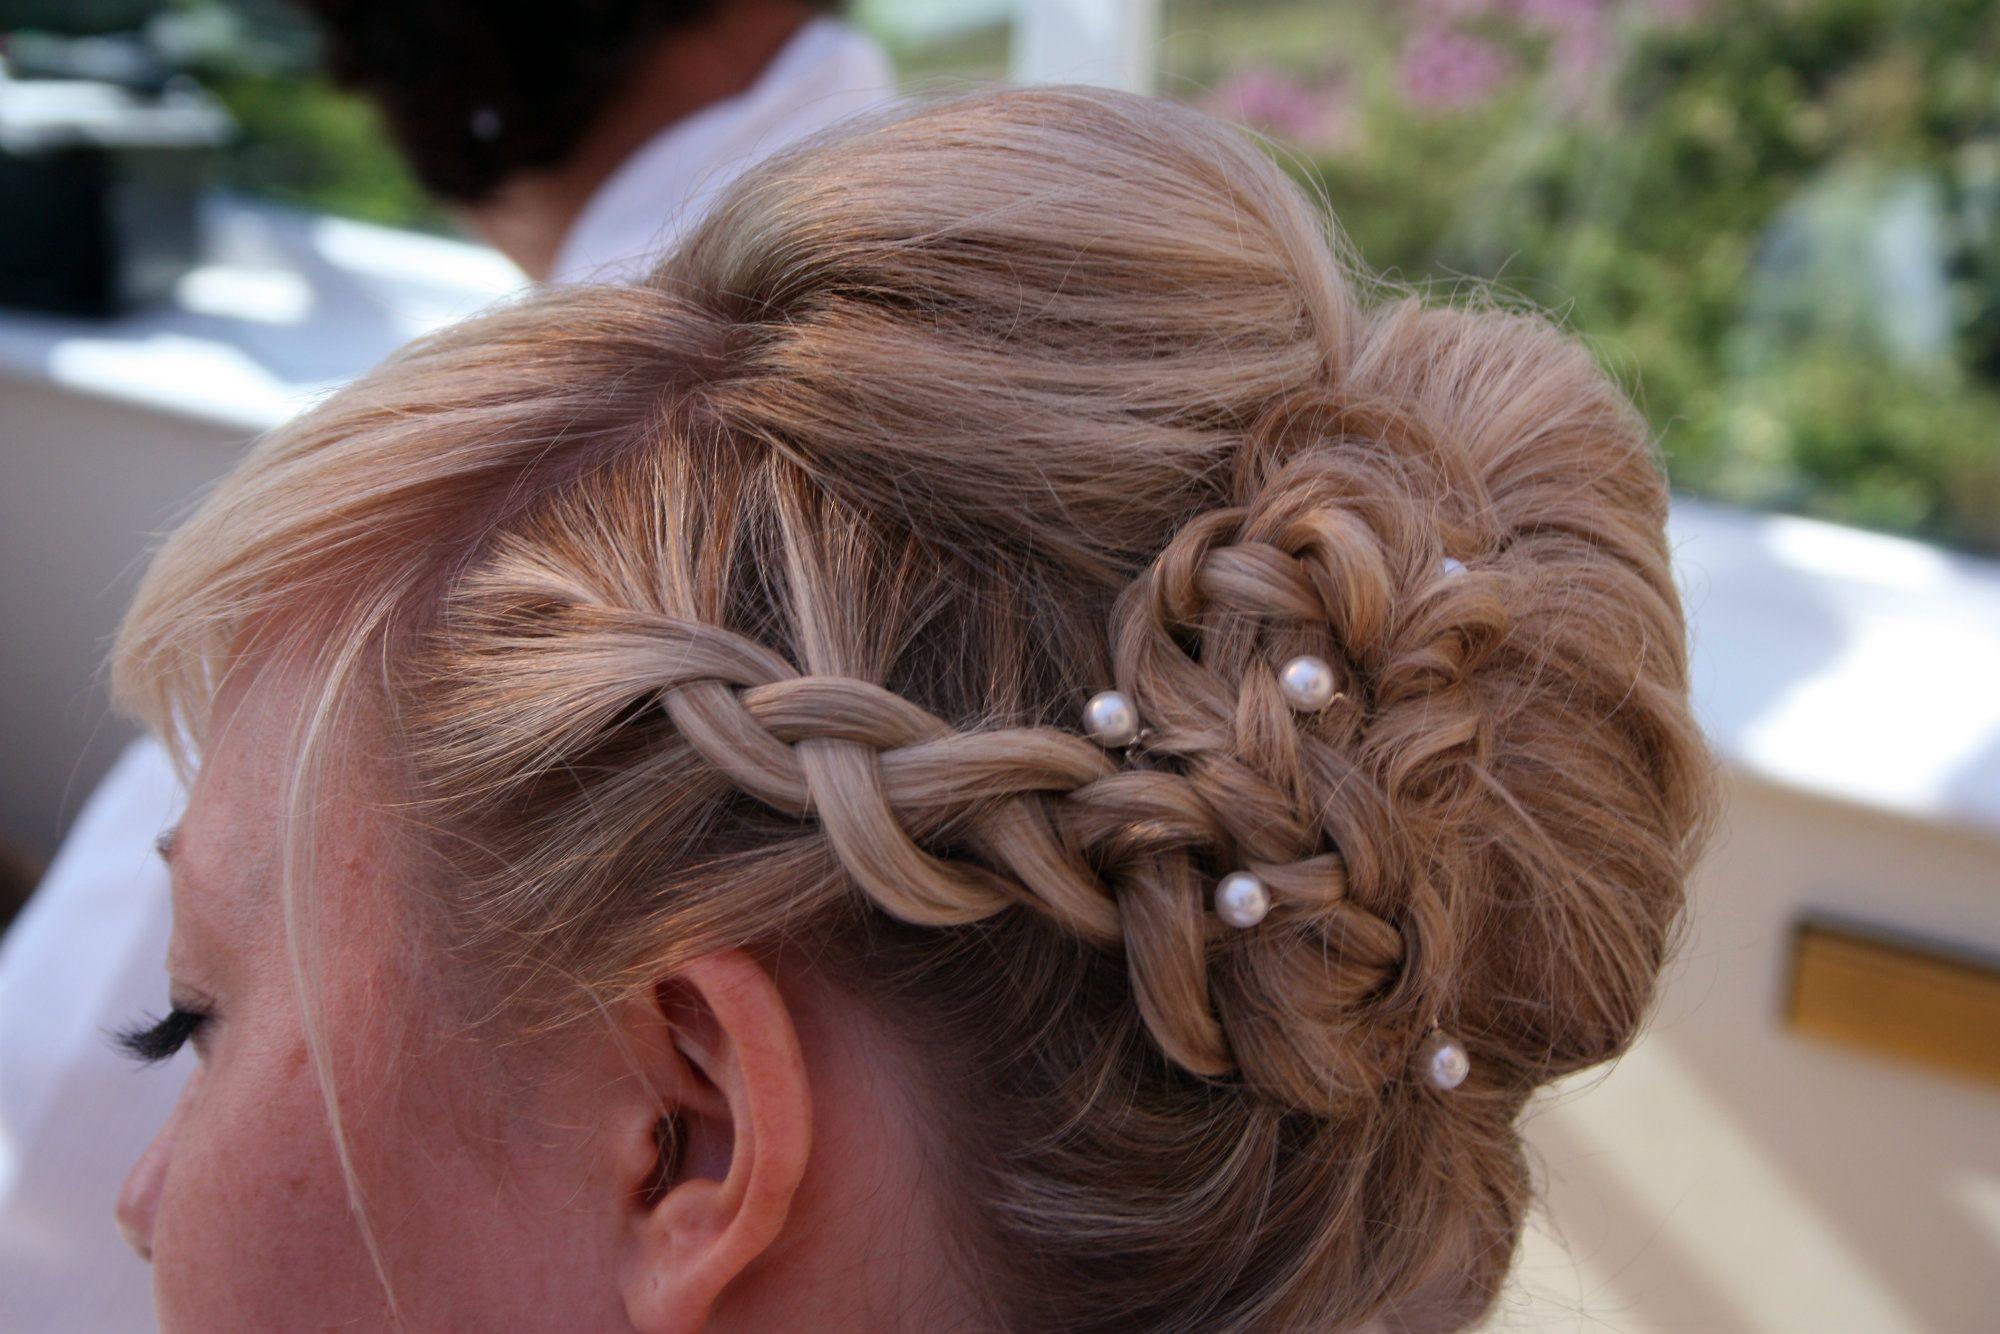 Bridal hair-pin-accessories Gloucestershire-UK